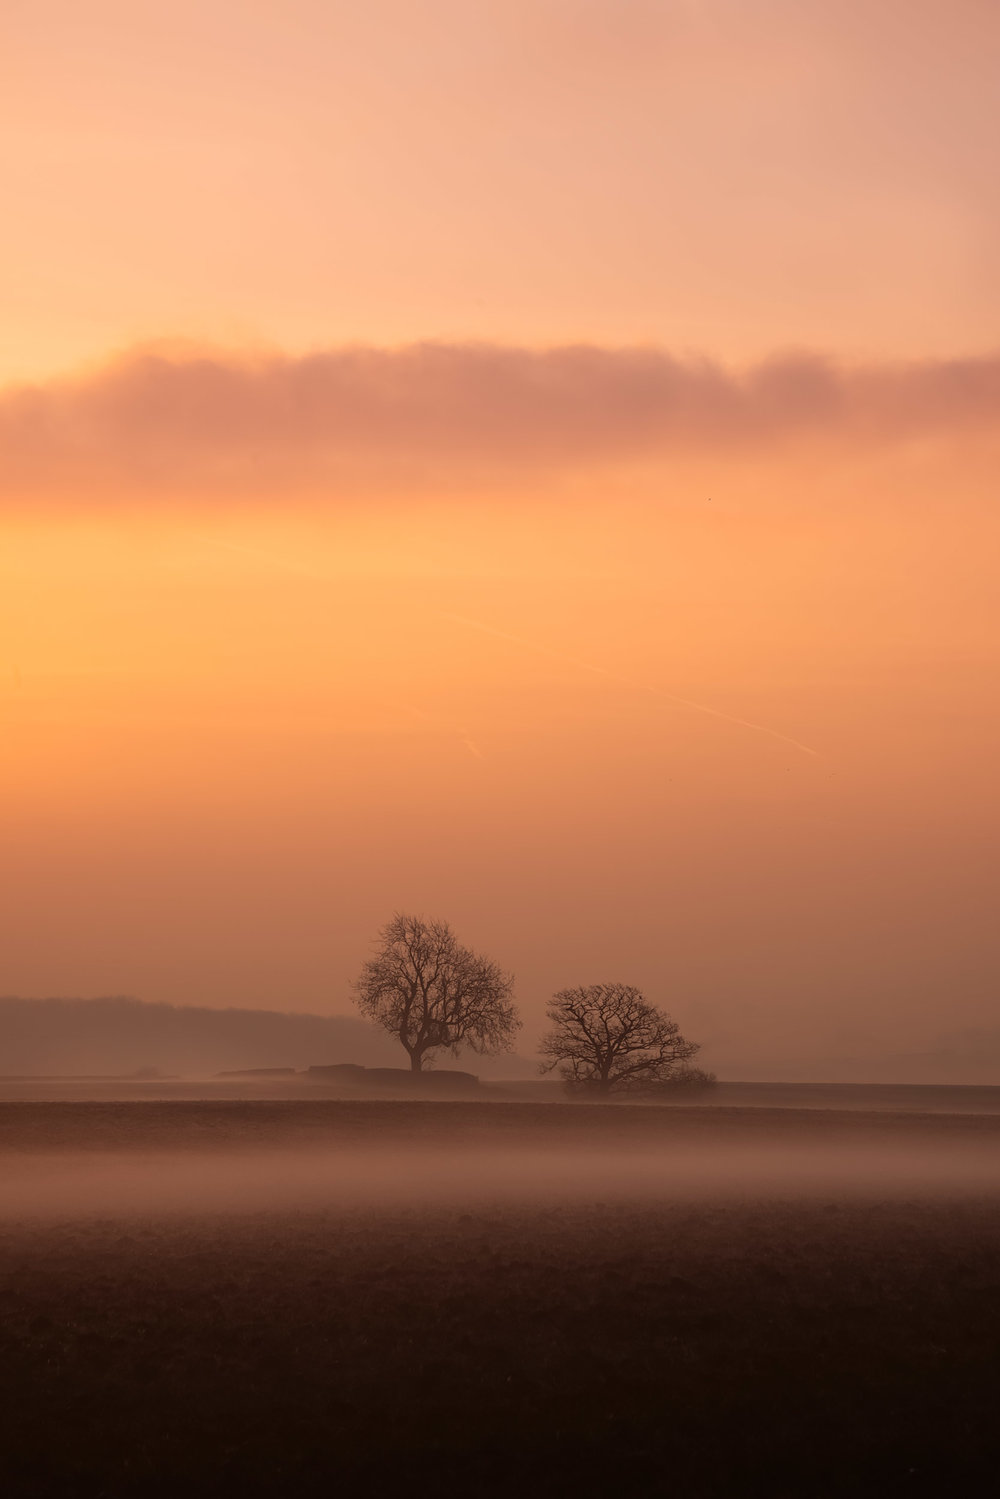 2019.02.16-Together-Foggy-Trees-WEB.jpg